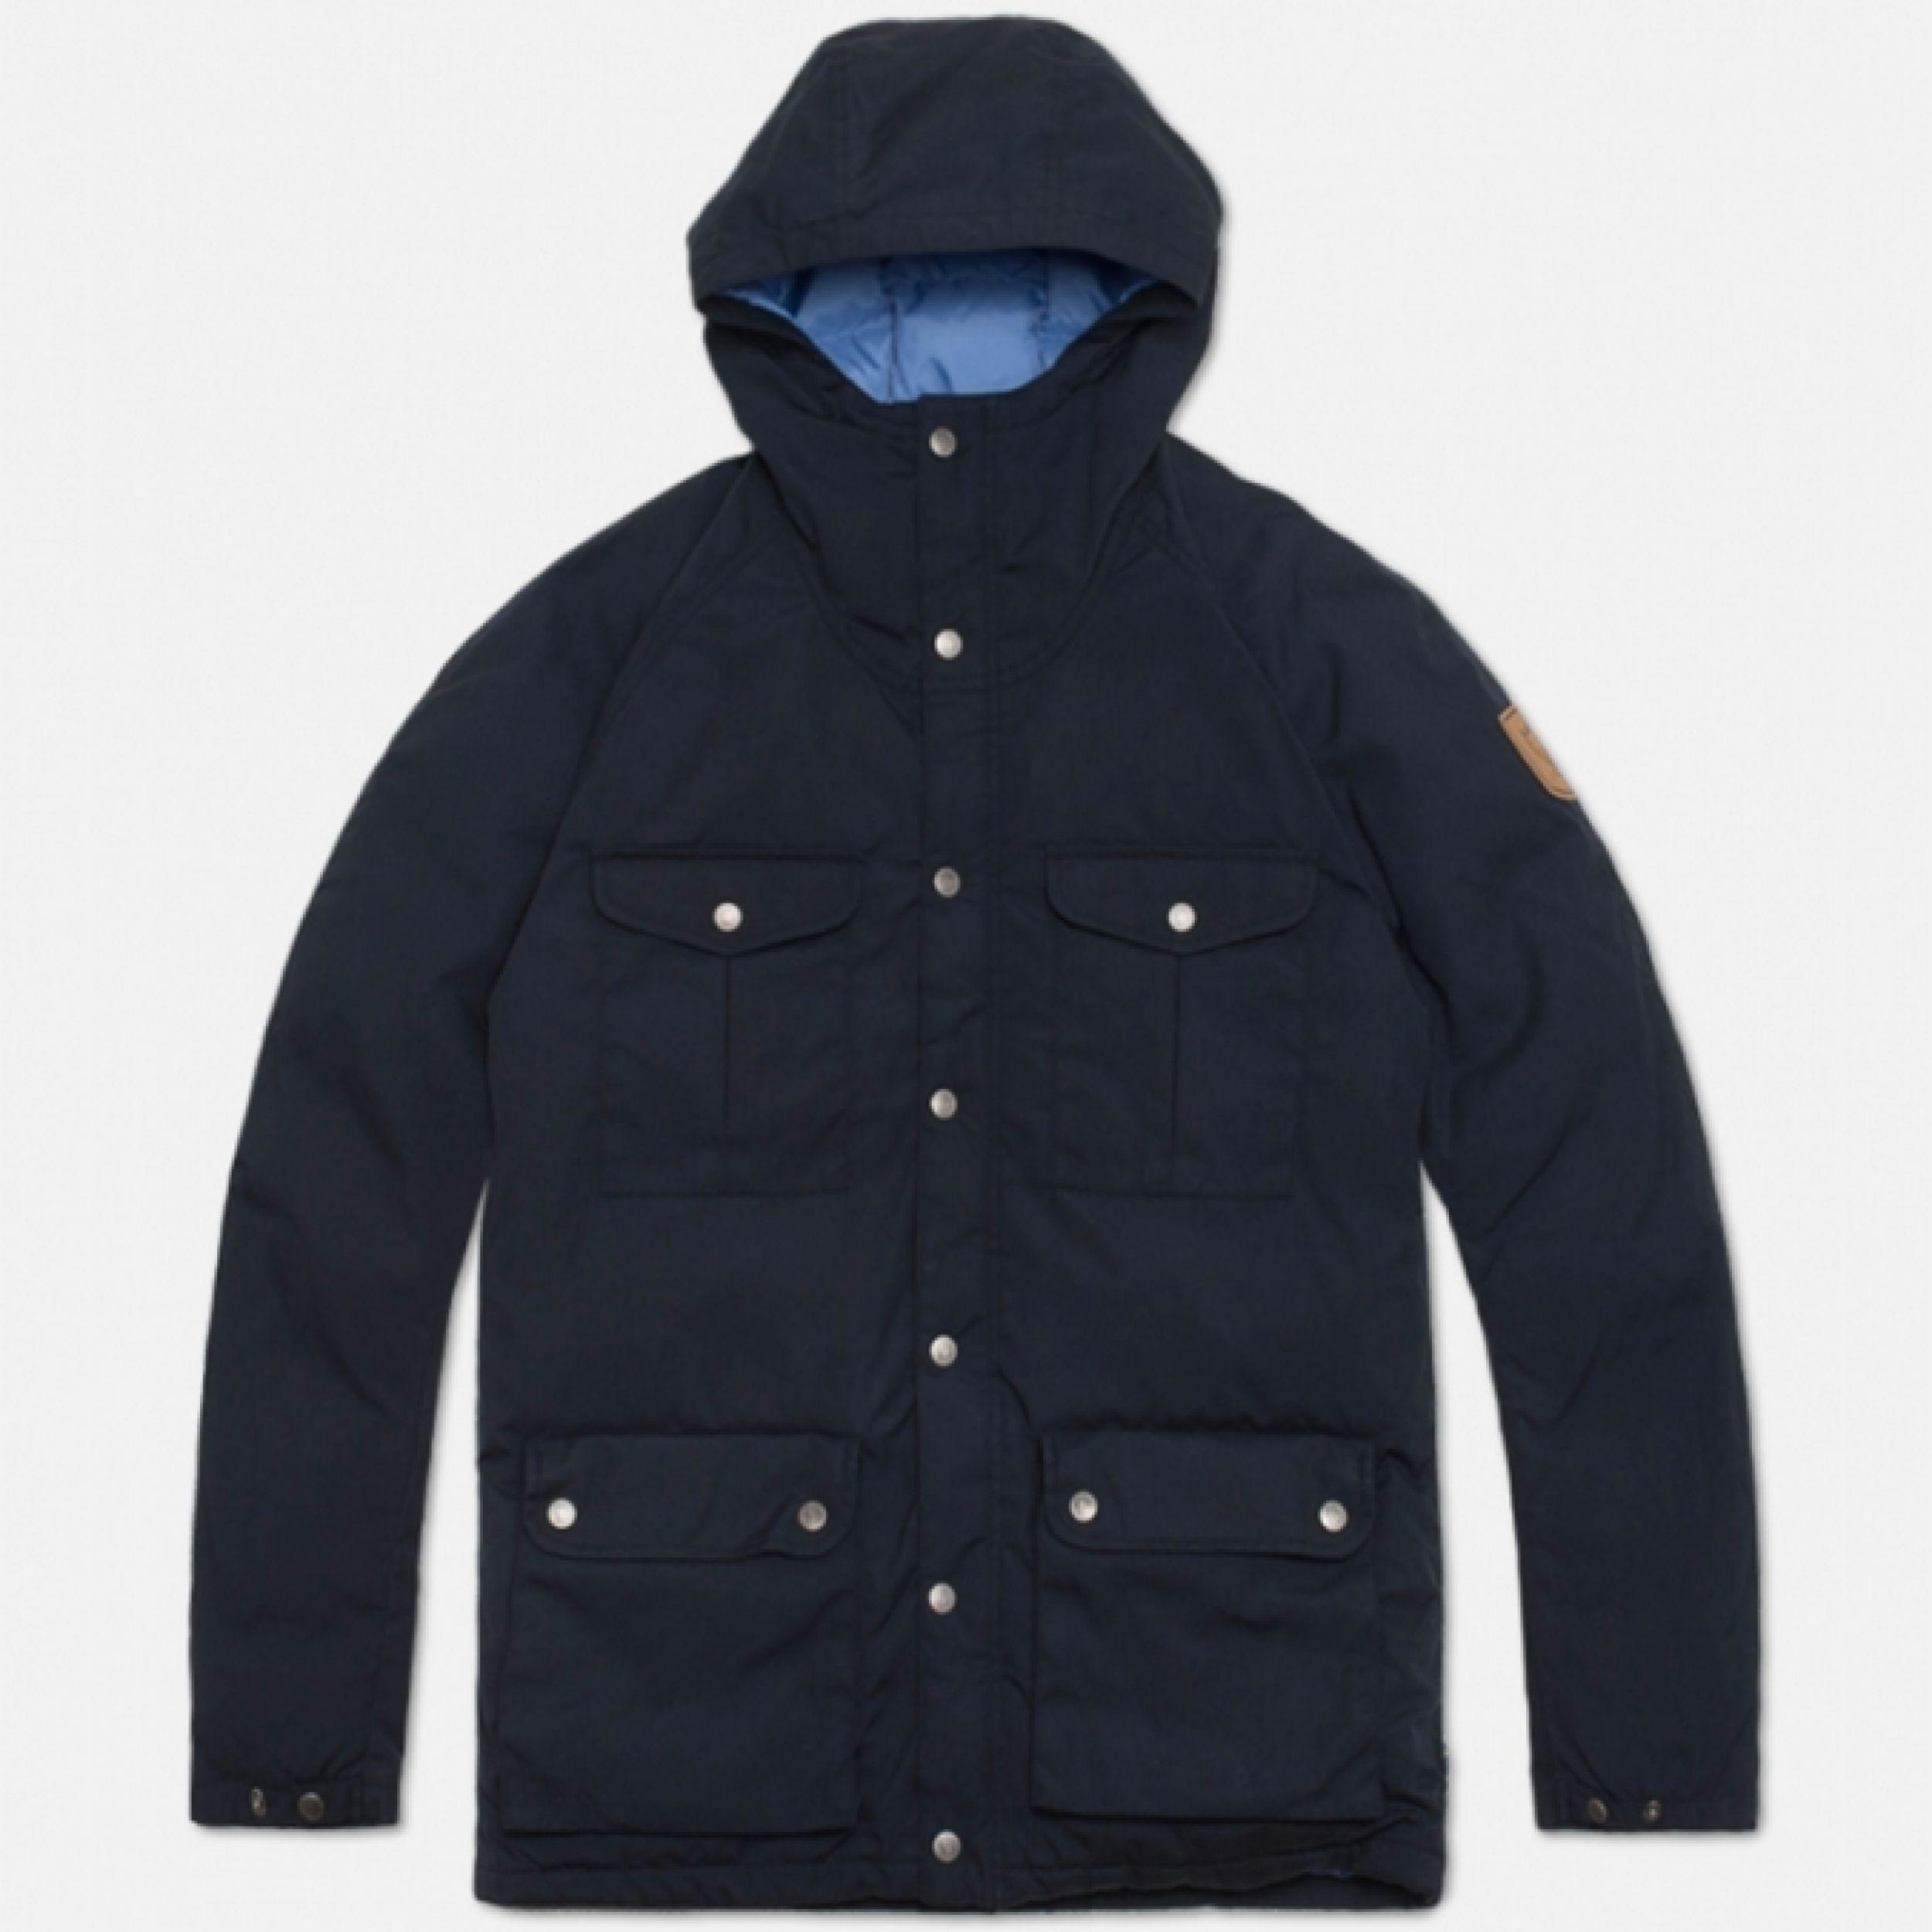 jacket-fjallraven-greenland-down-jacket-dark-navy-15-676x676a.jpg